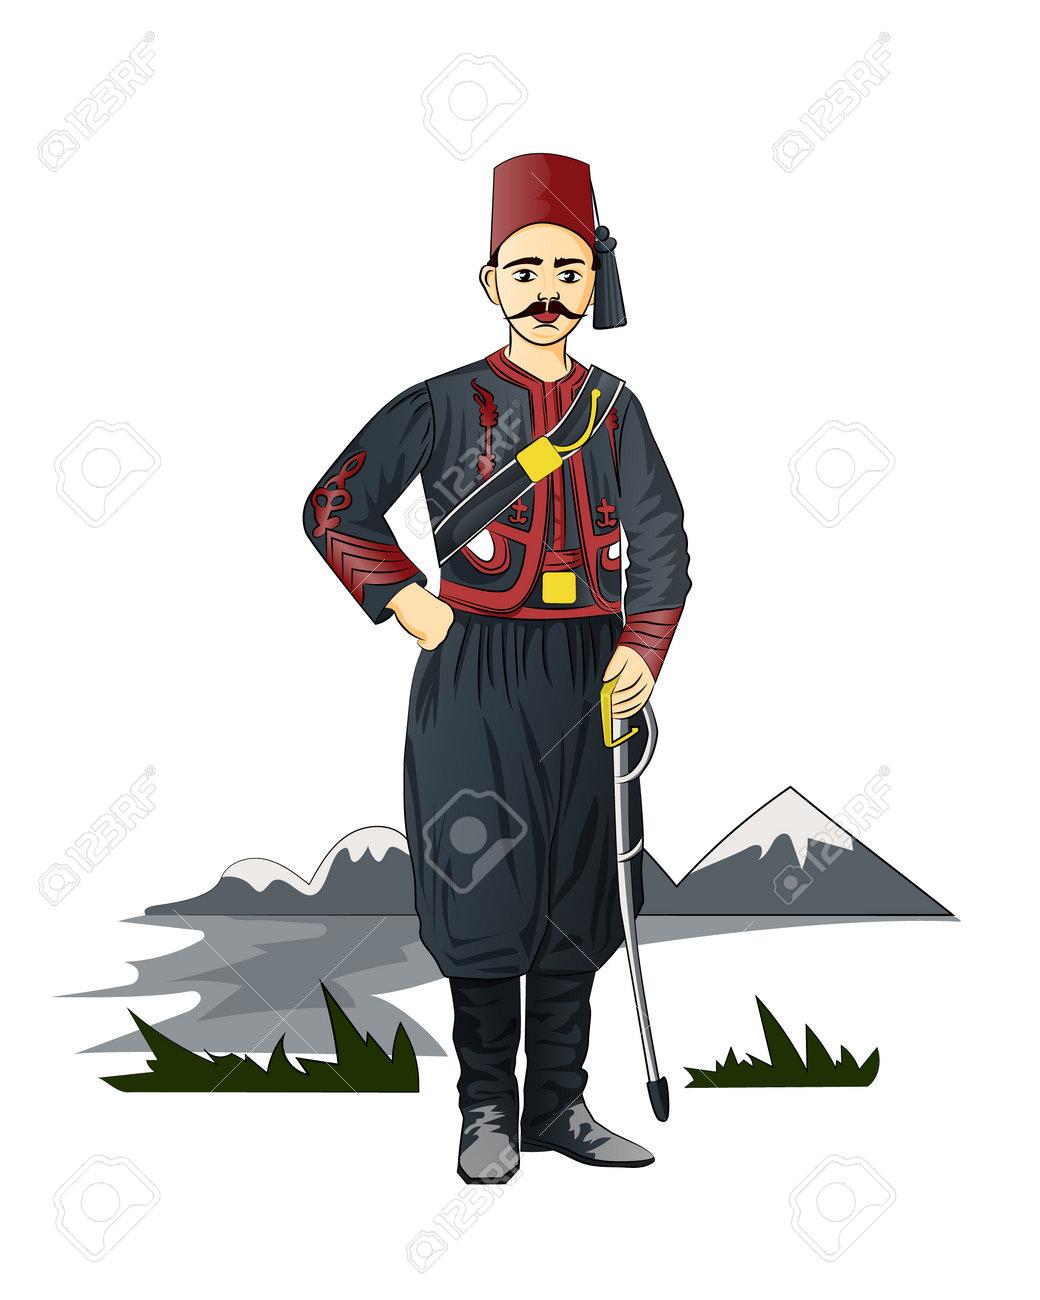 Turkish sailor army uniform. - 161244221